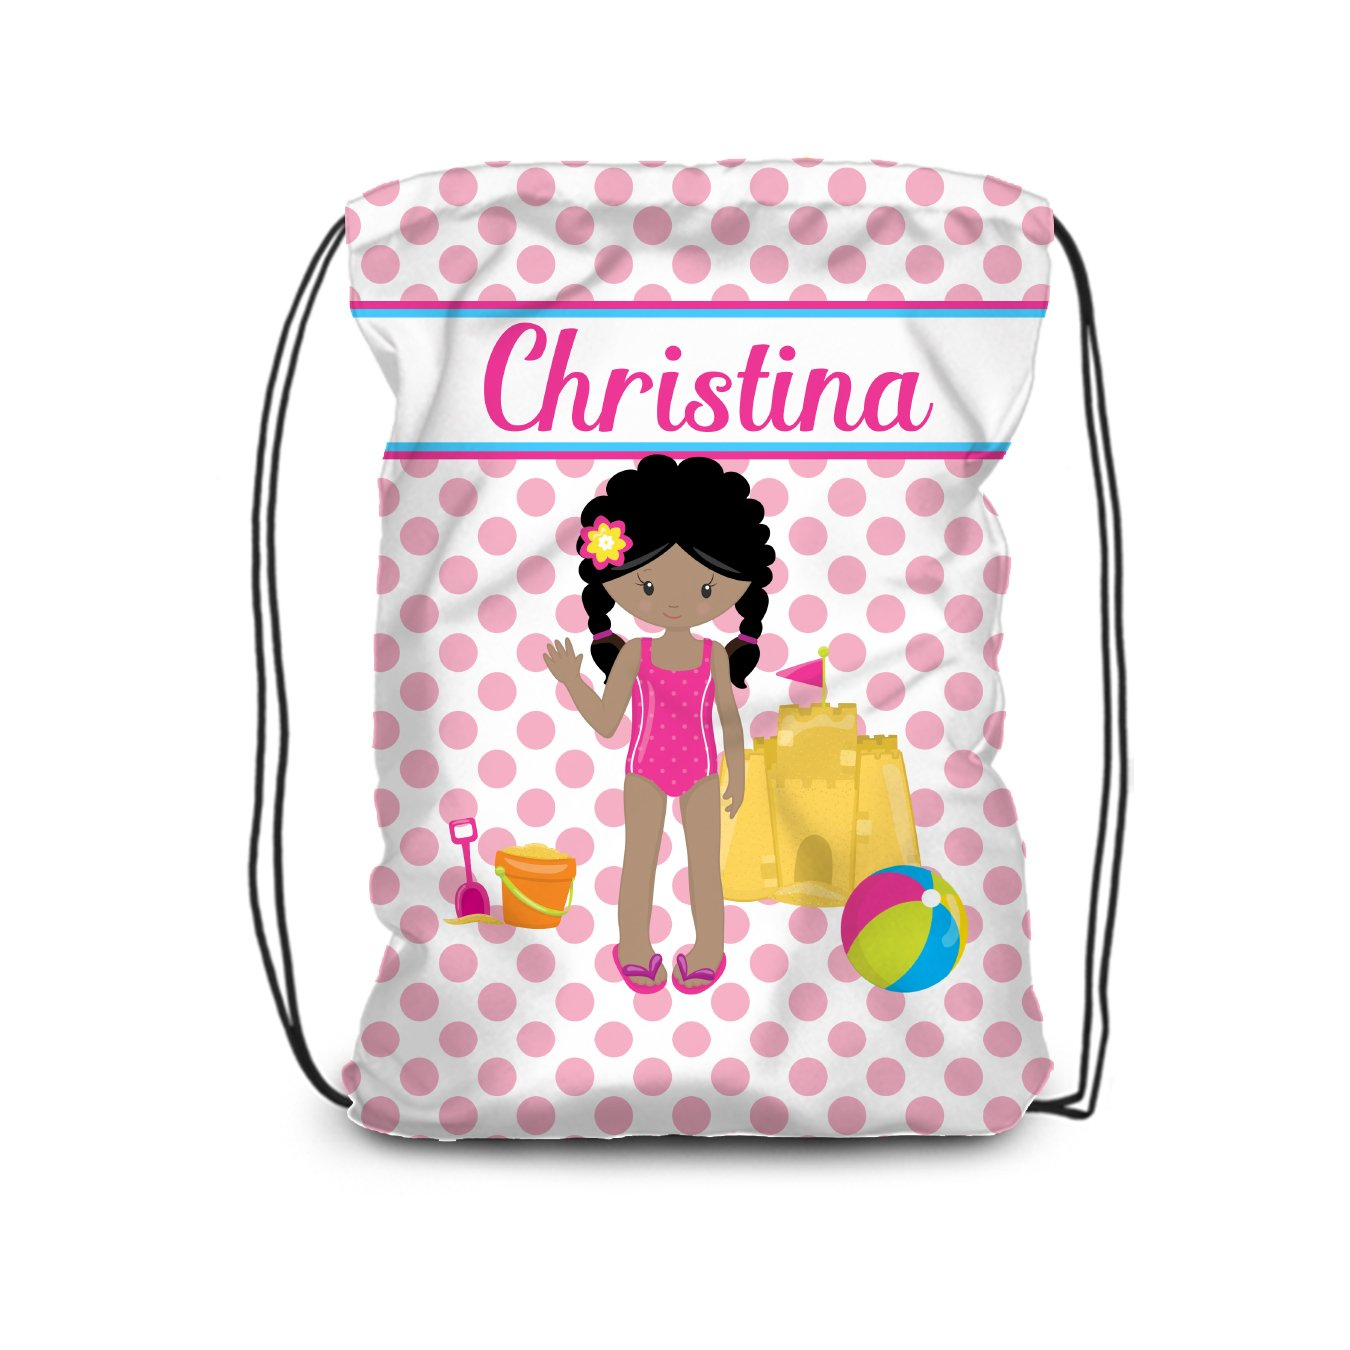 Beach Drawstring Backpack - Girl Pink Dot Pool Bag